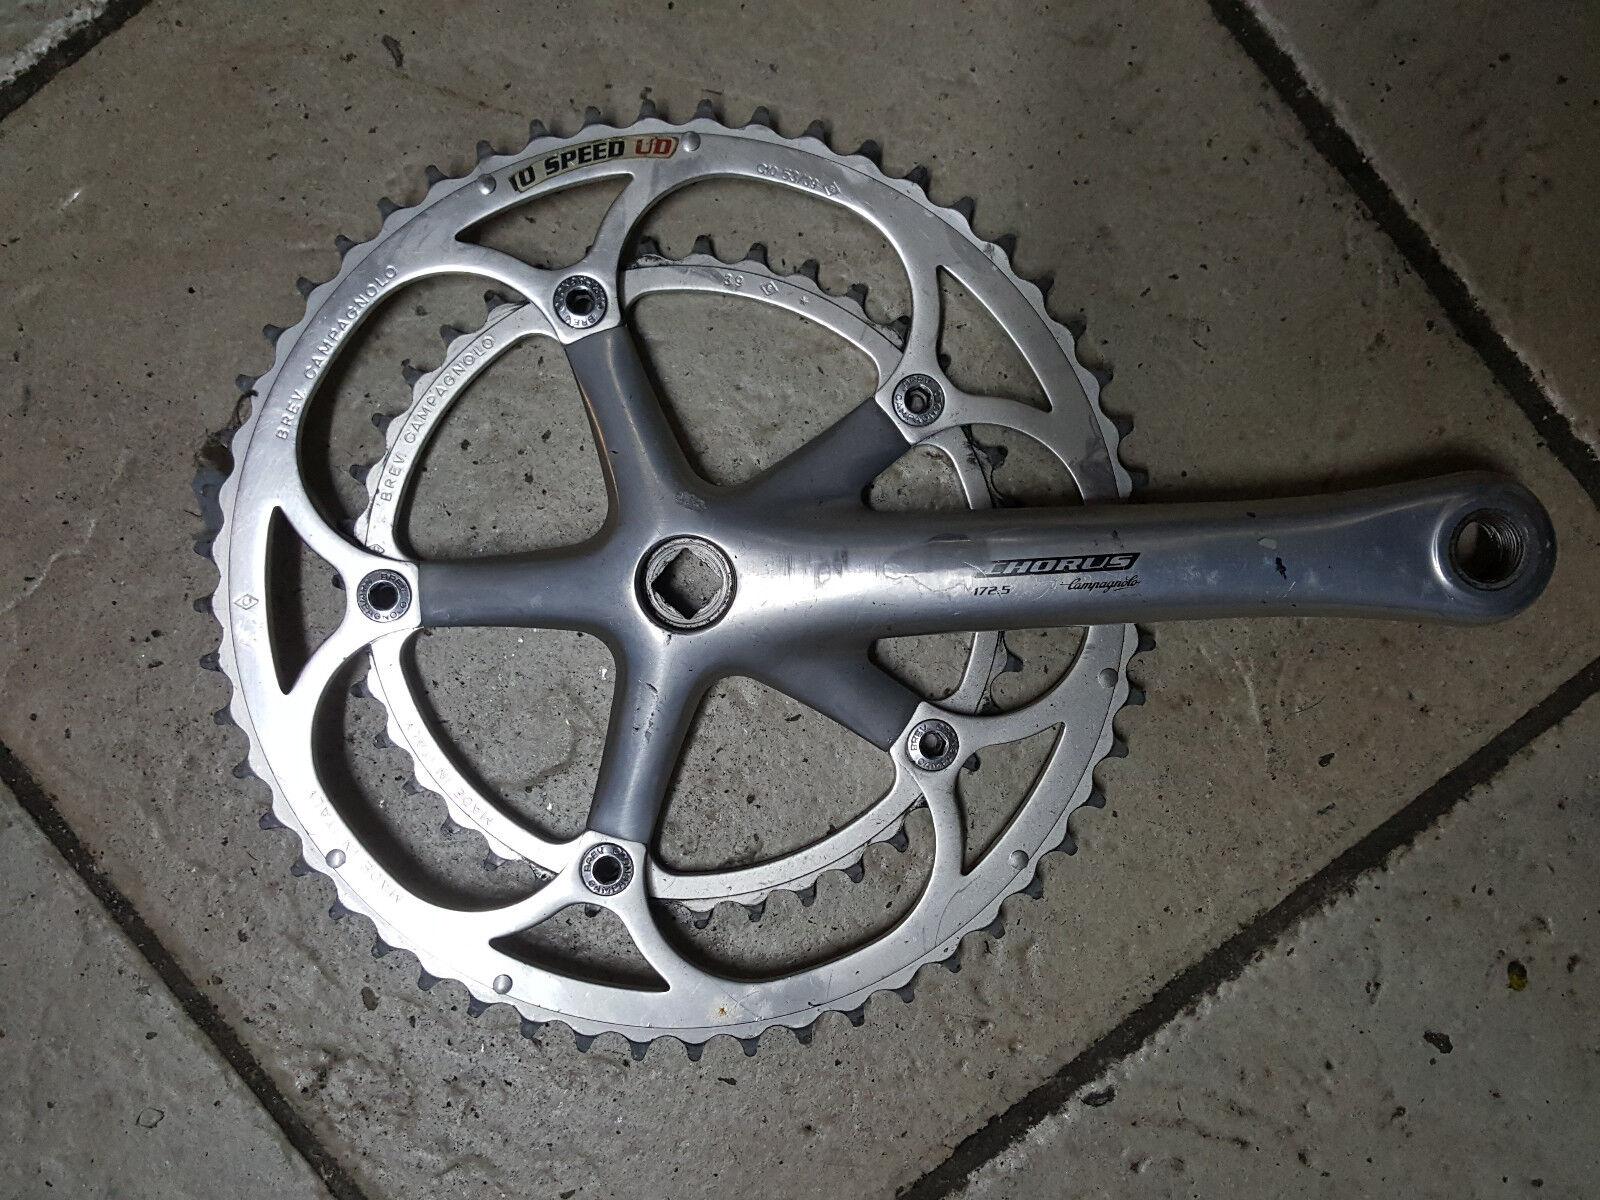 Guarnitura destra Campagnolo Chorus  10 bike right Crankset 172.5 53-39  compras de moda online